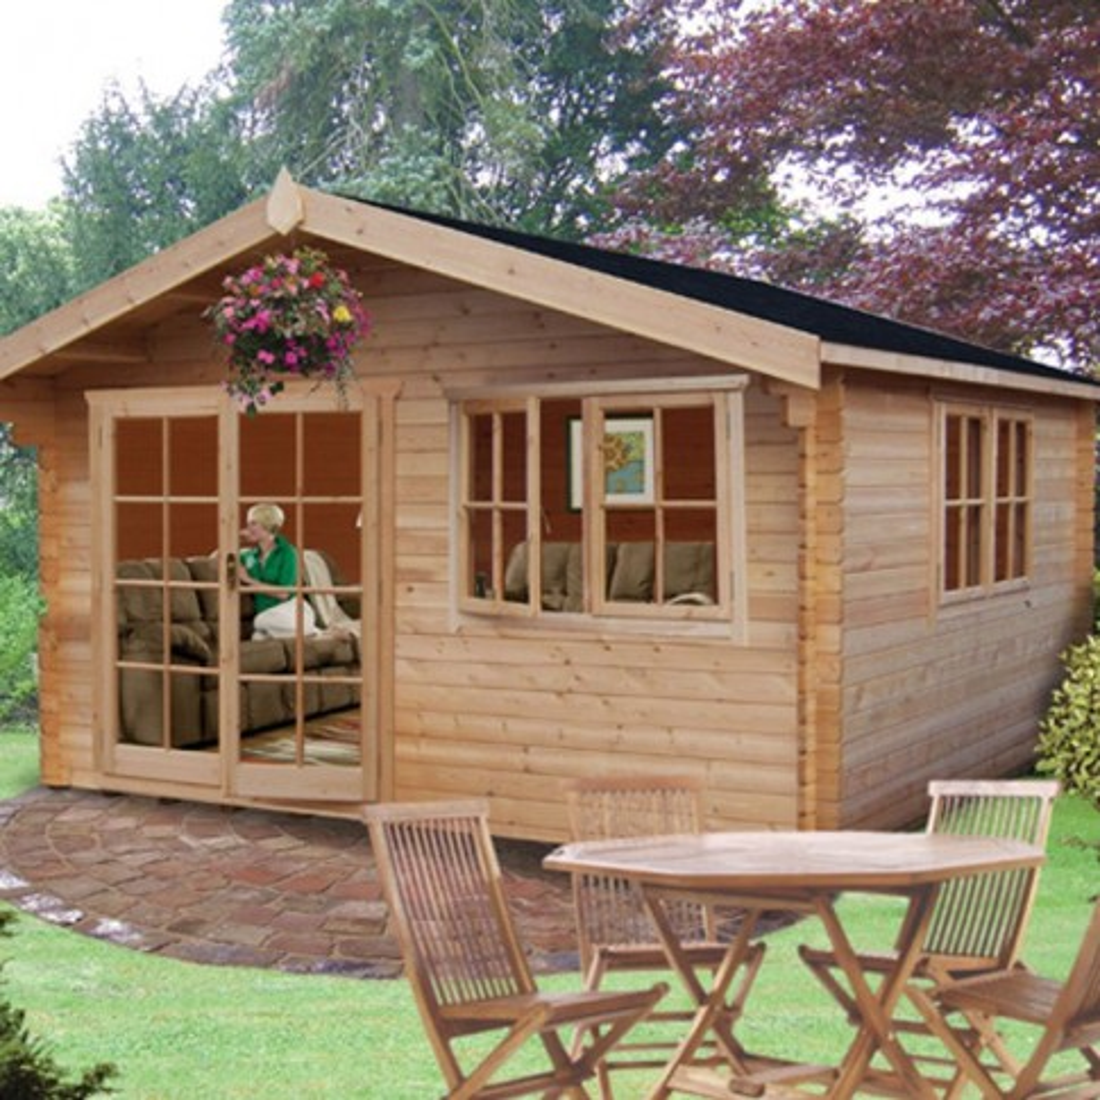 Shire Abbeyford Pine Lodge 28mm